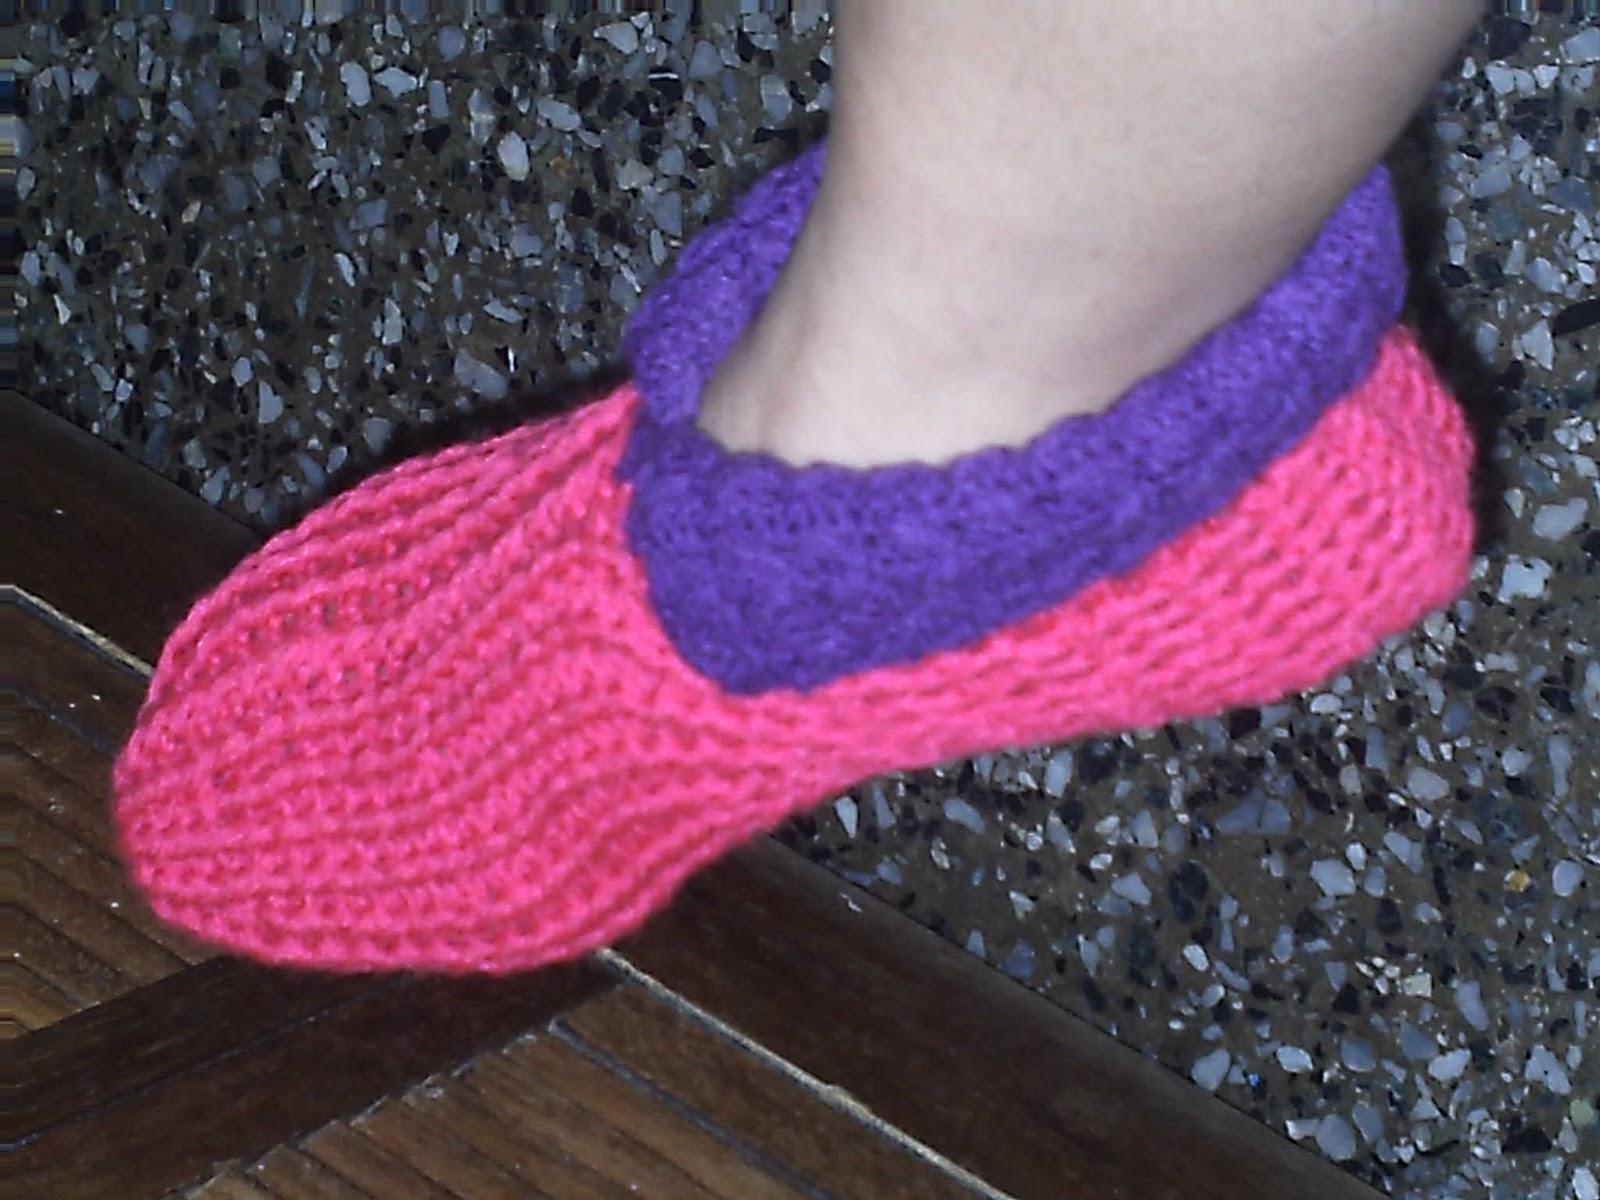 medias tejidas a crochet - botitas o medias de navidad tejidas a ...